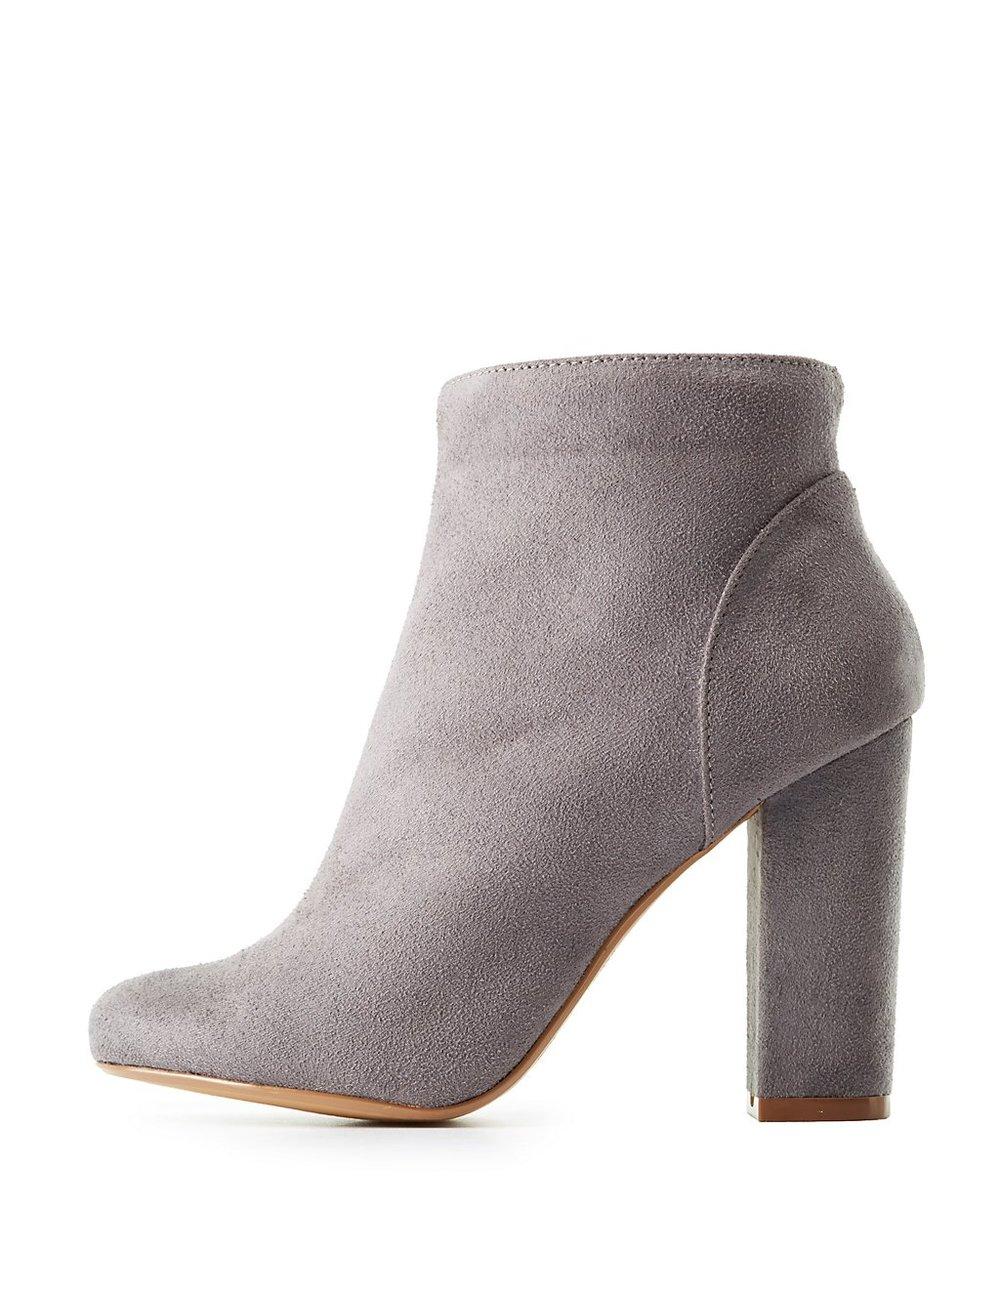 black friday sales charlottle russe heeled grey booties